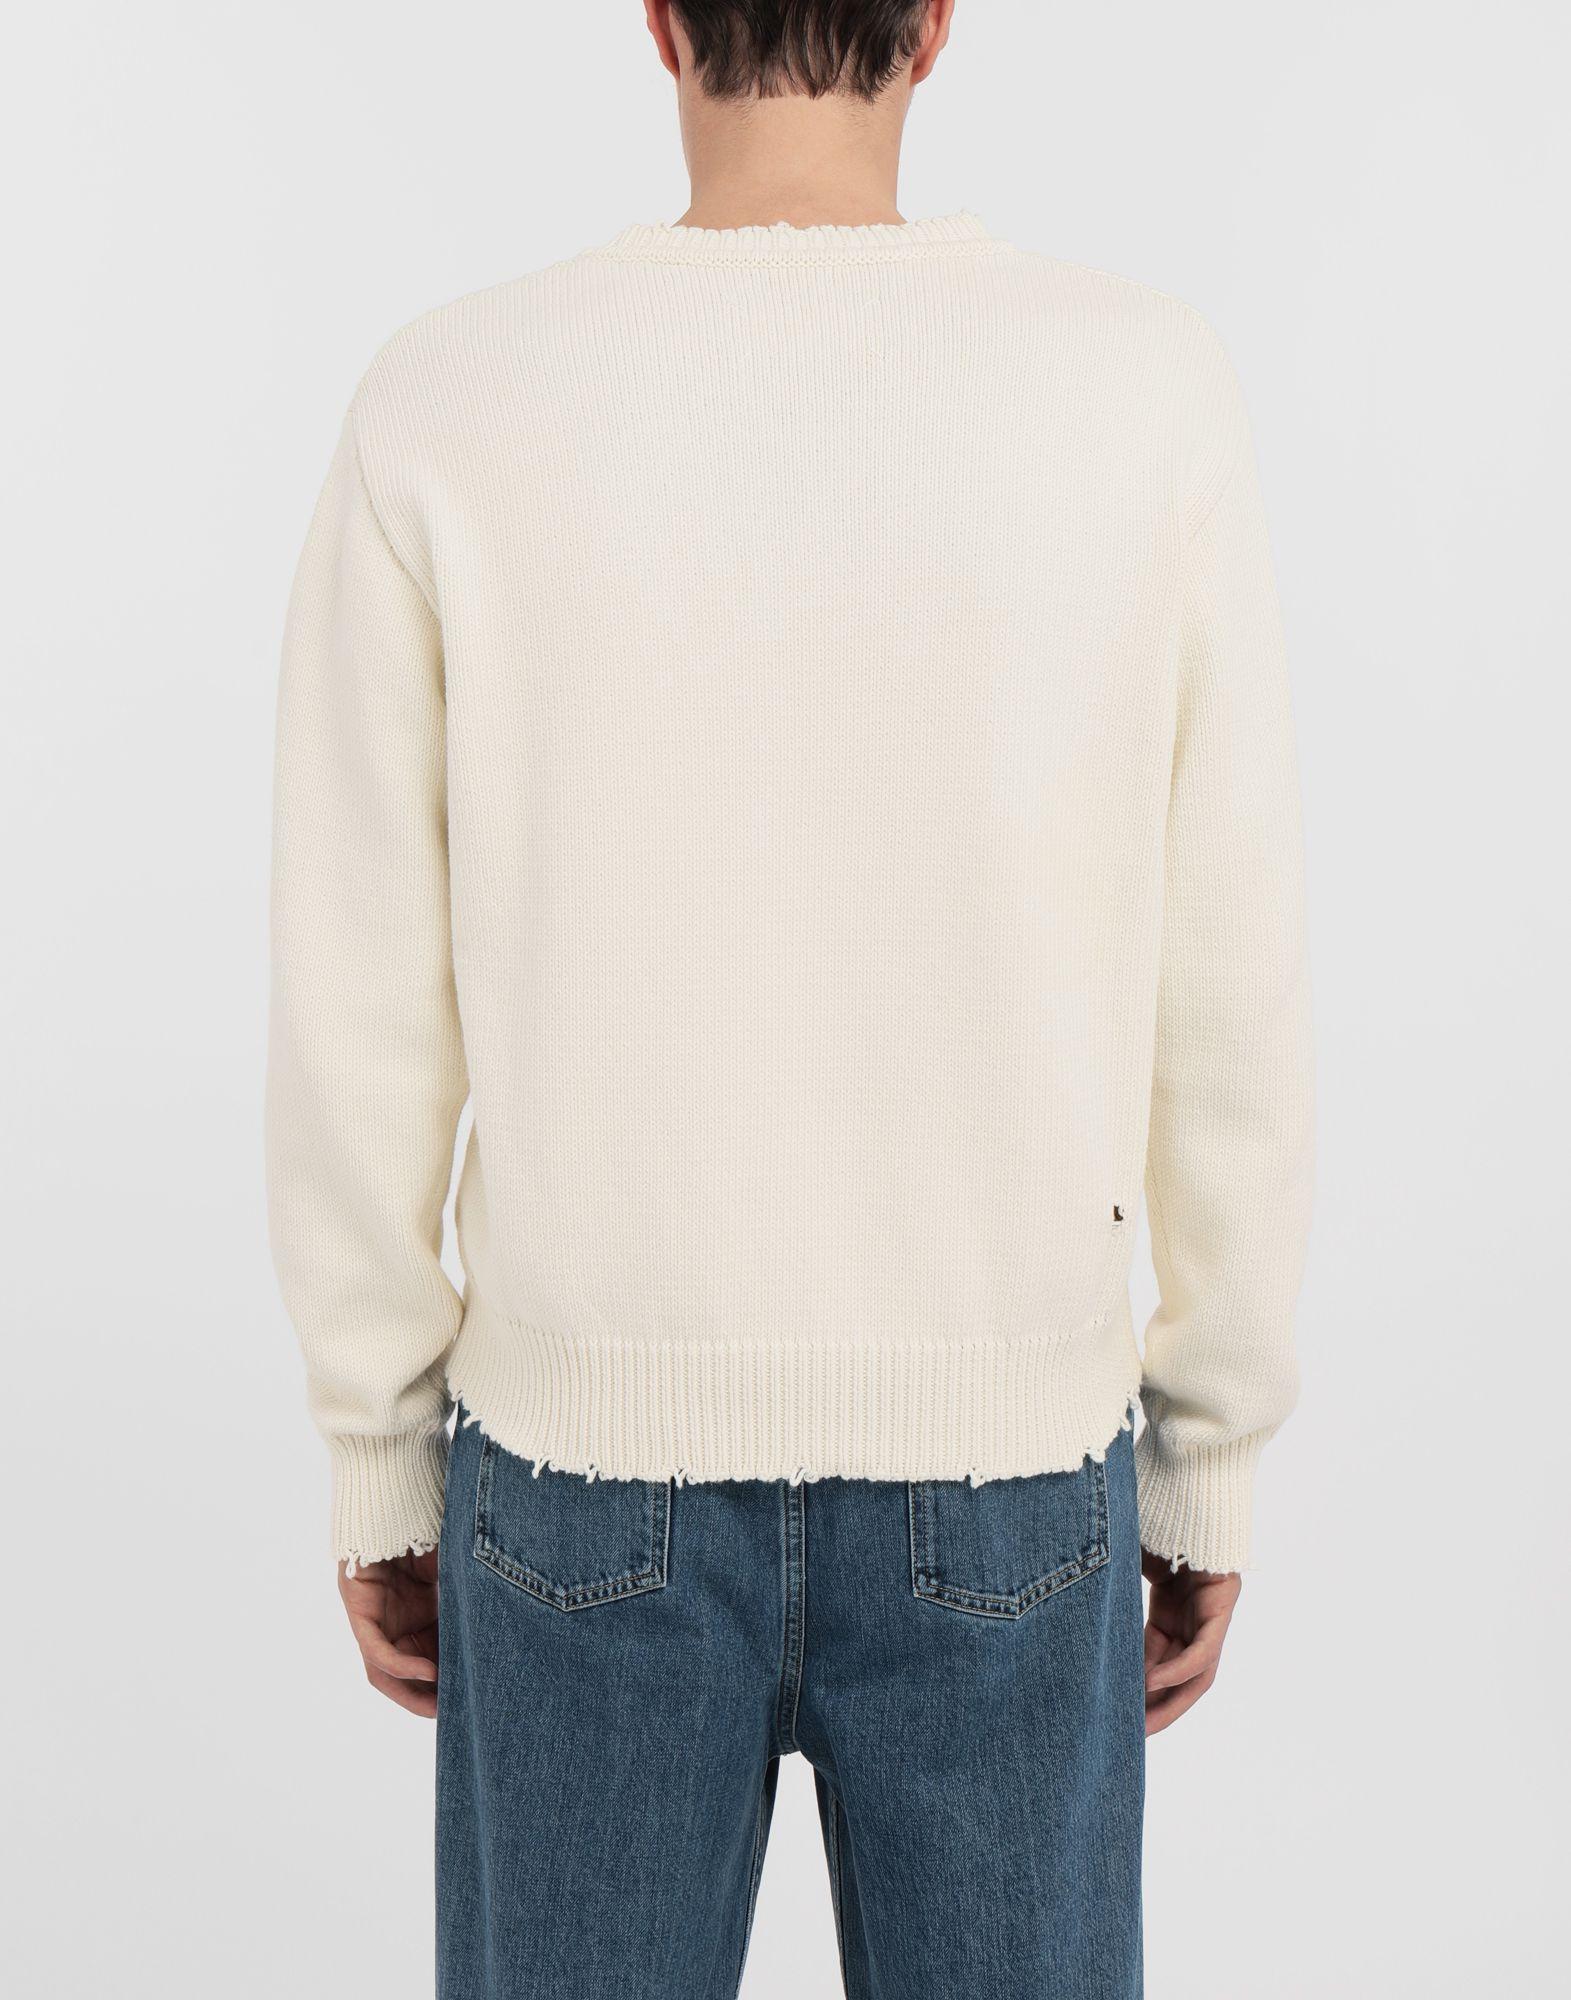 MAISON MARGIELA Destroyed knit pullover Crewneck sweater Man e